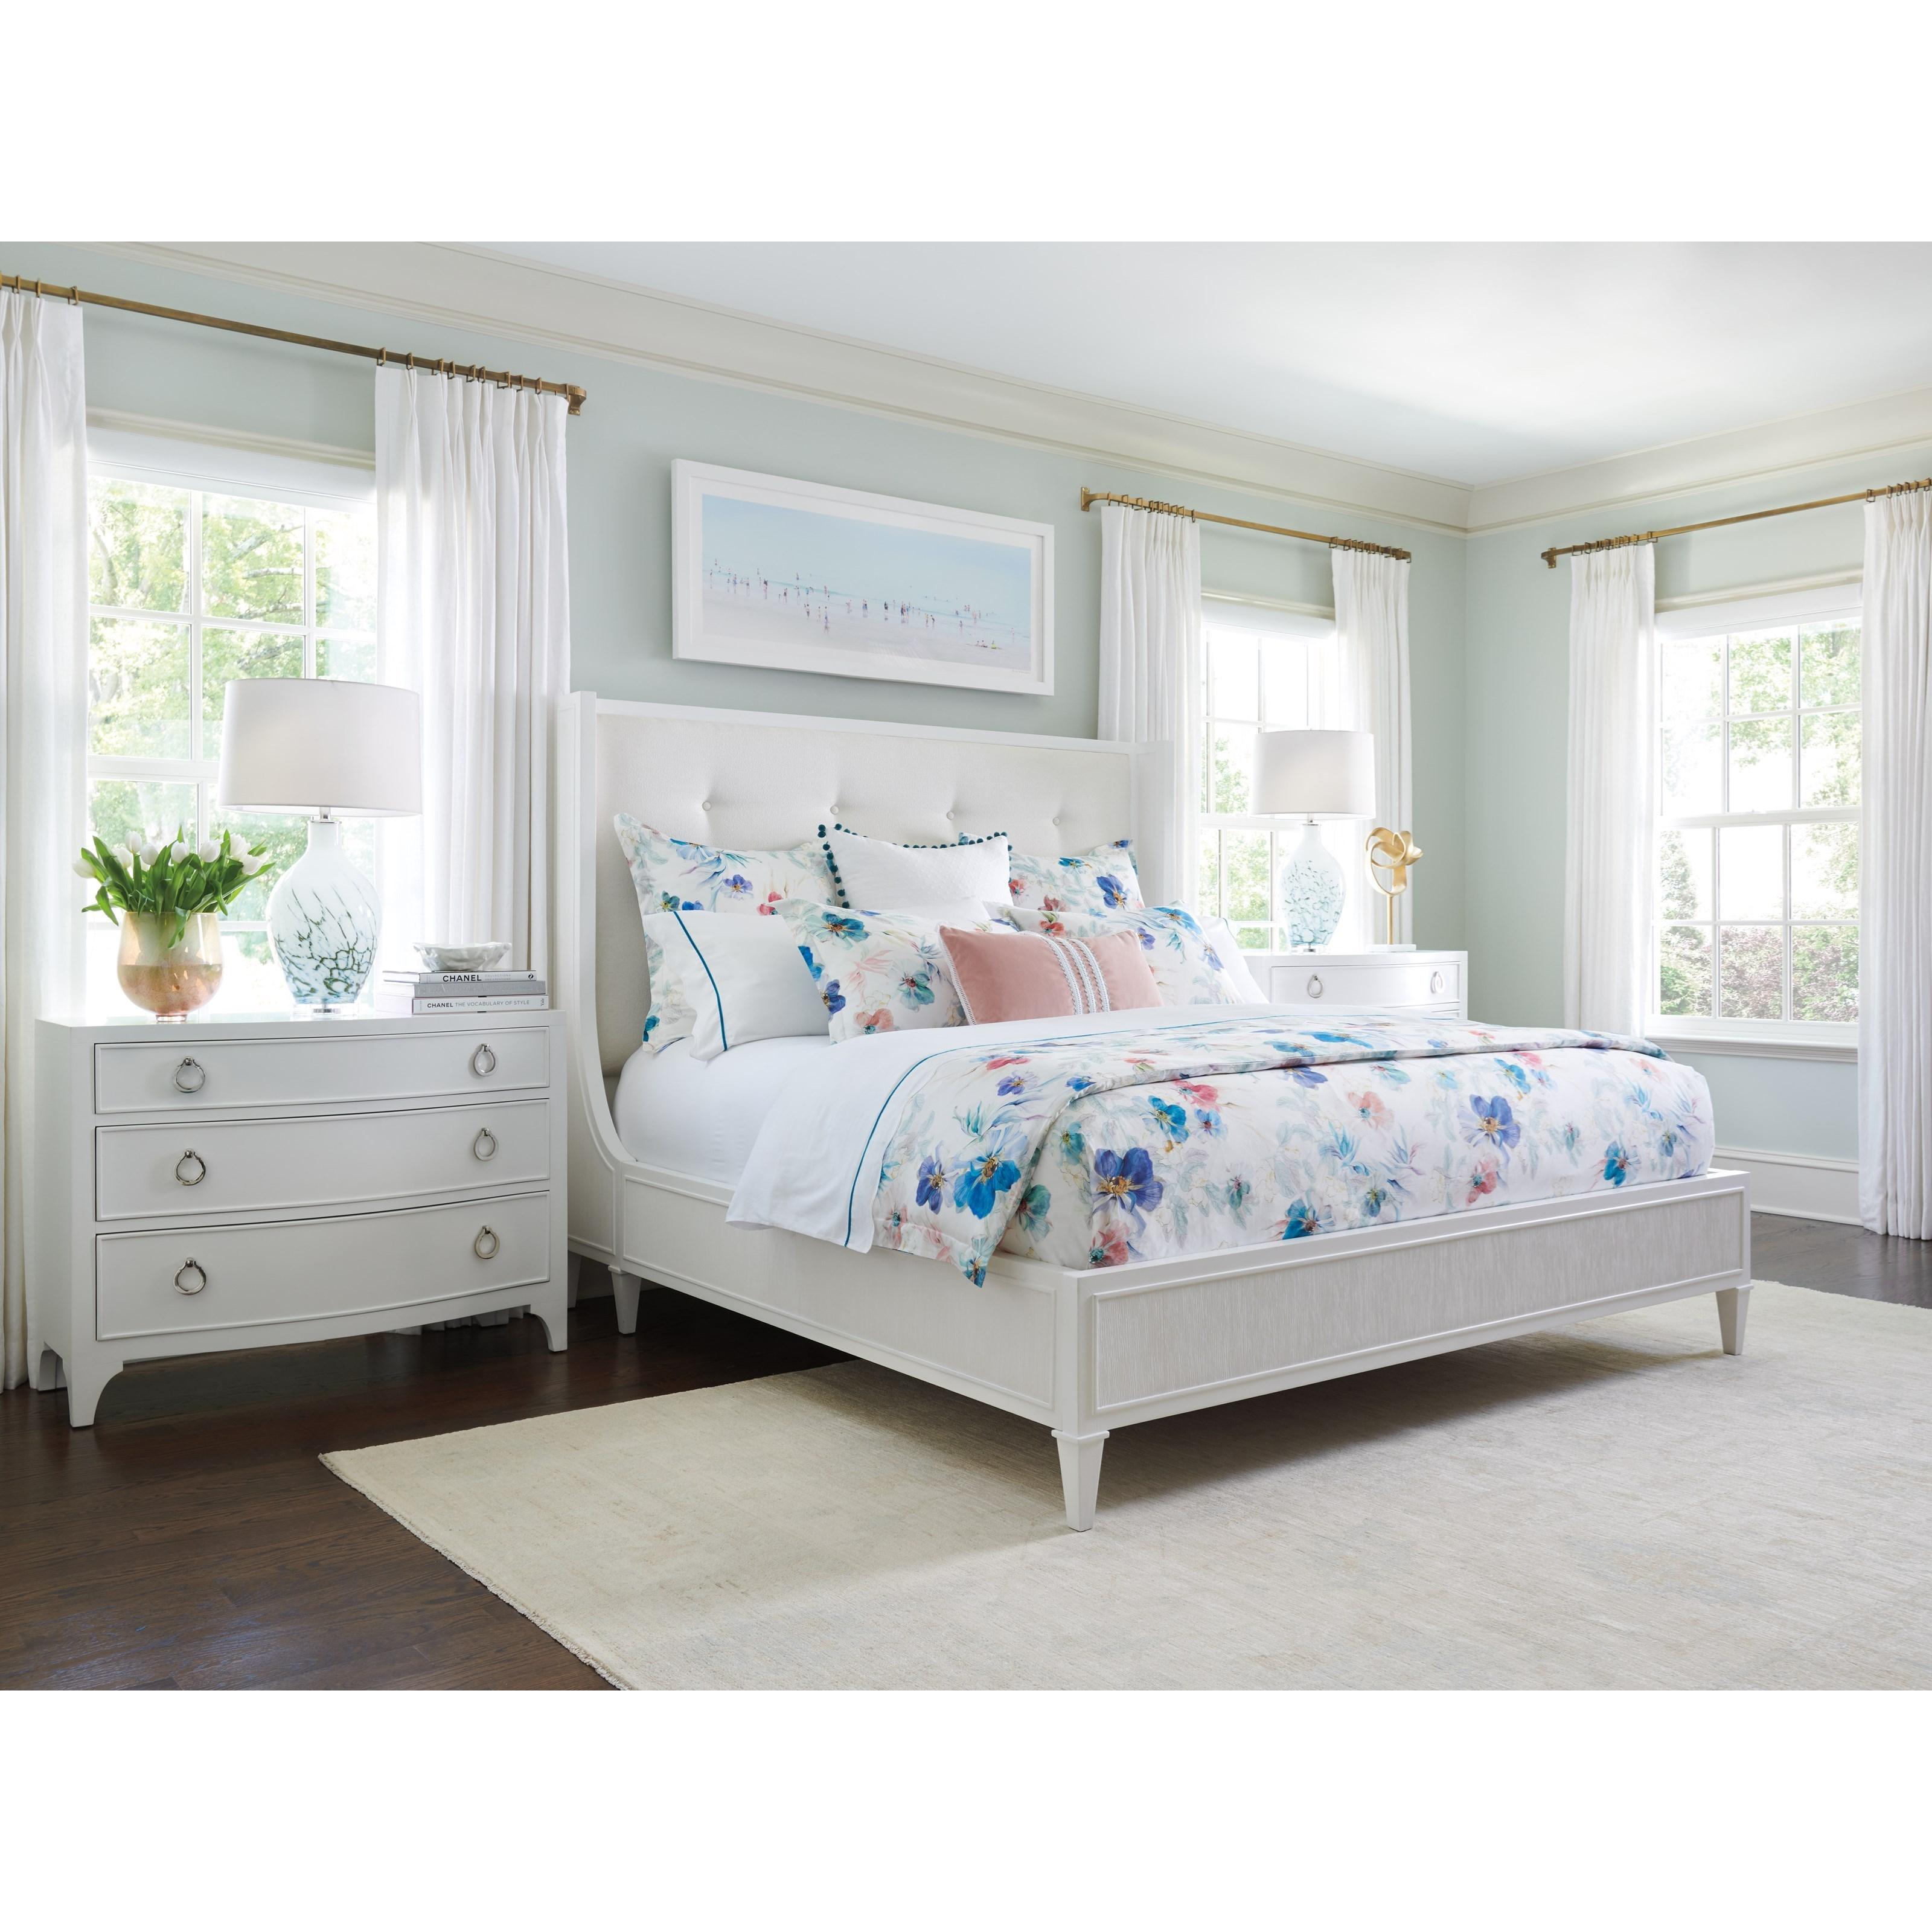 Avondale California King Bedroom Group by Lexington at Johnny Janosik